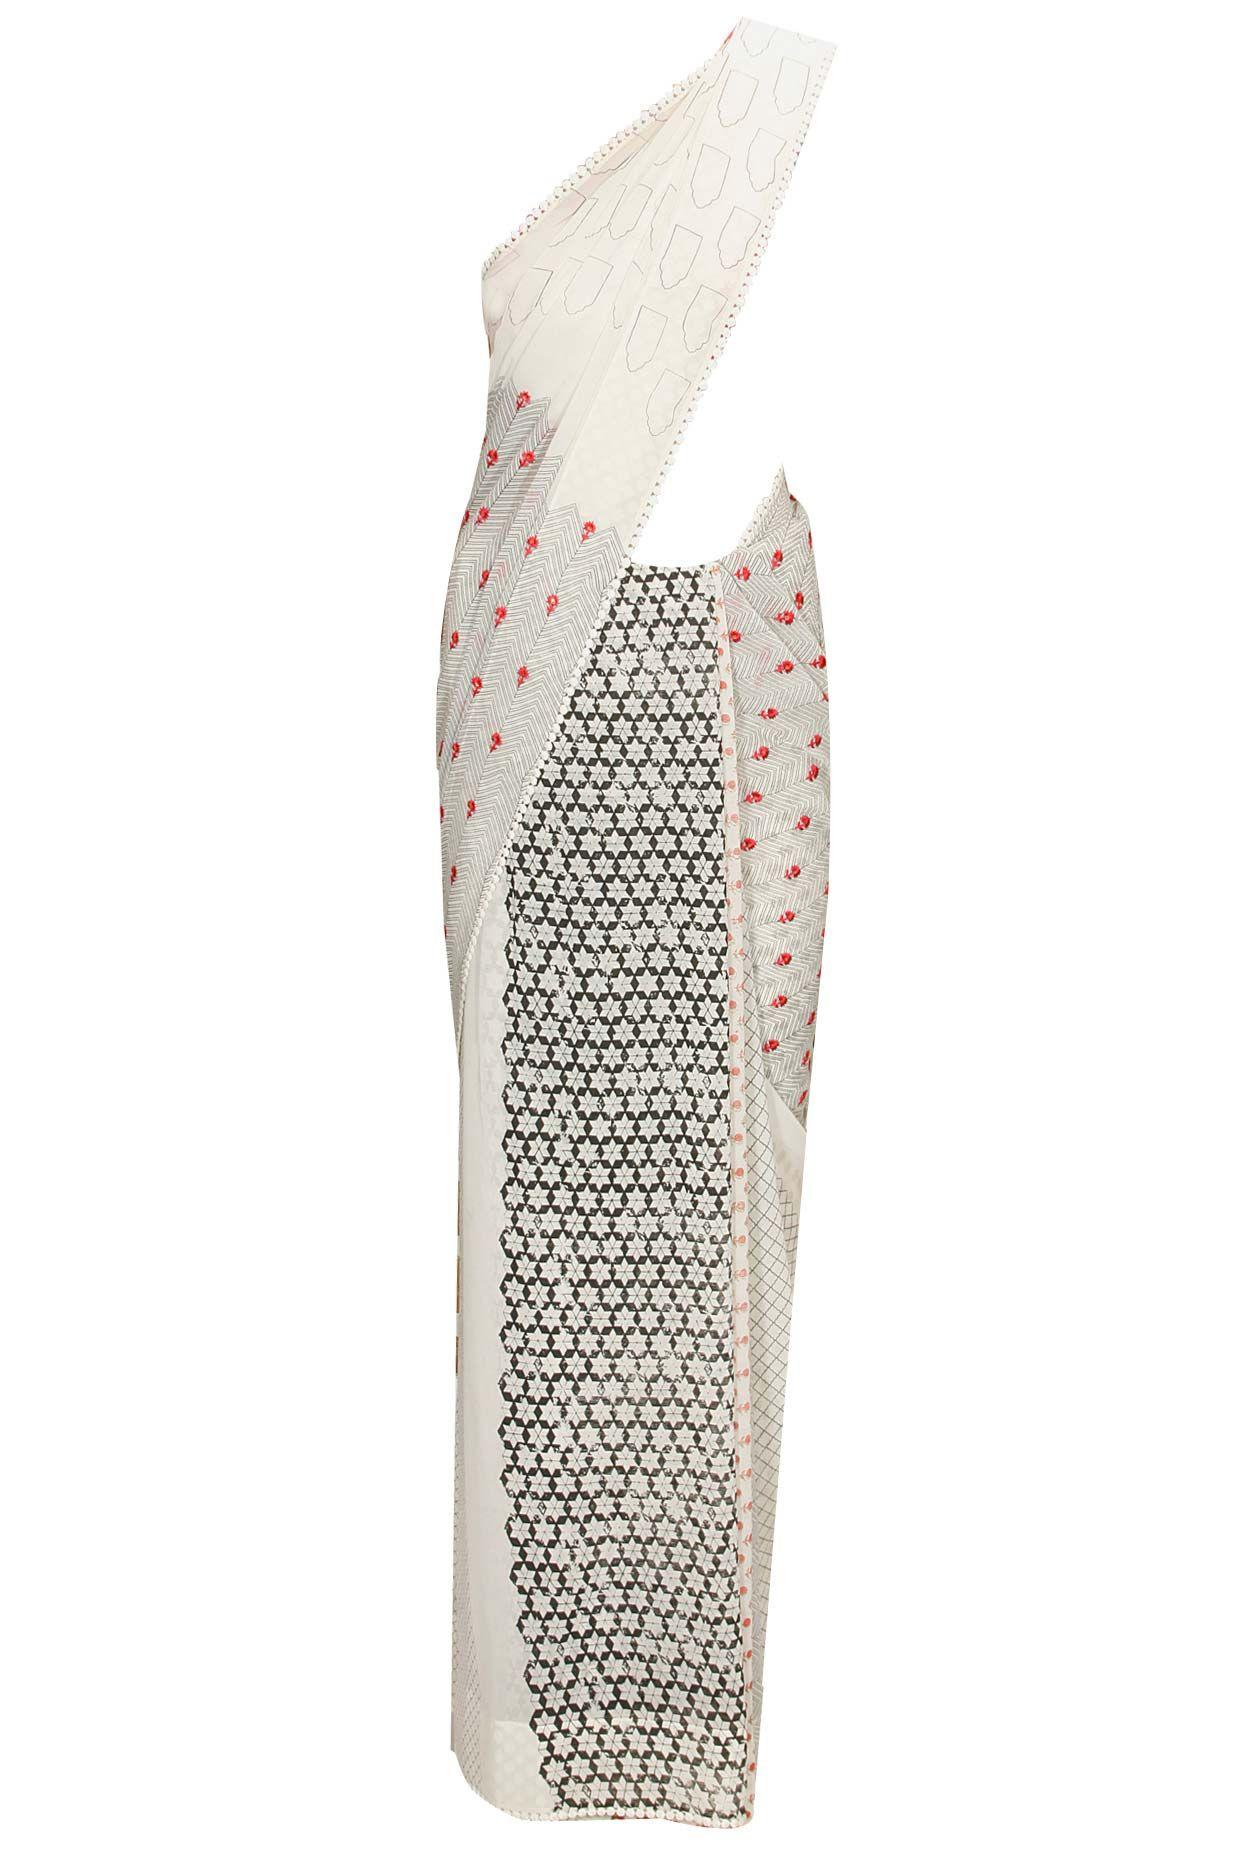 ivory floral embroidered sari pink bustier and ombre jacket modi sari anju modi anjumodi shopnow shopnow perniaspopupshop saree ke saree choli exotic n n beauty designers anju